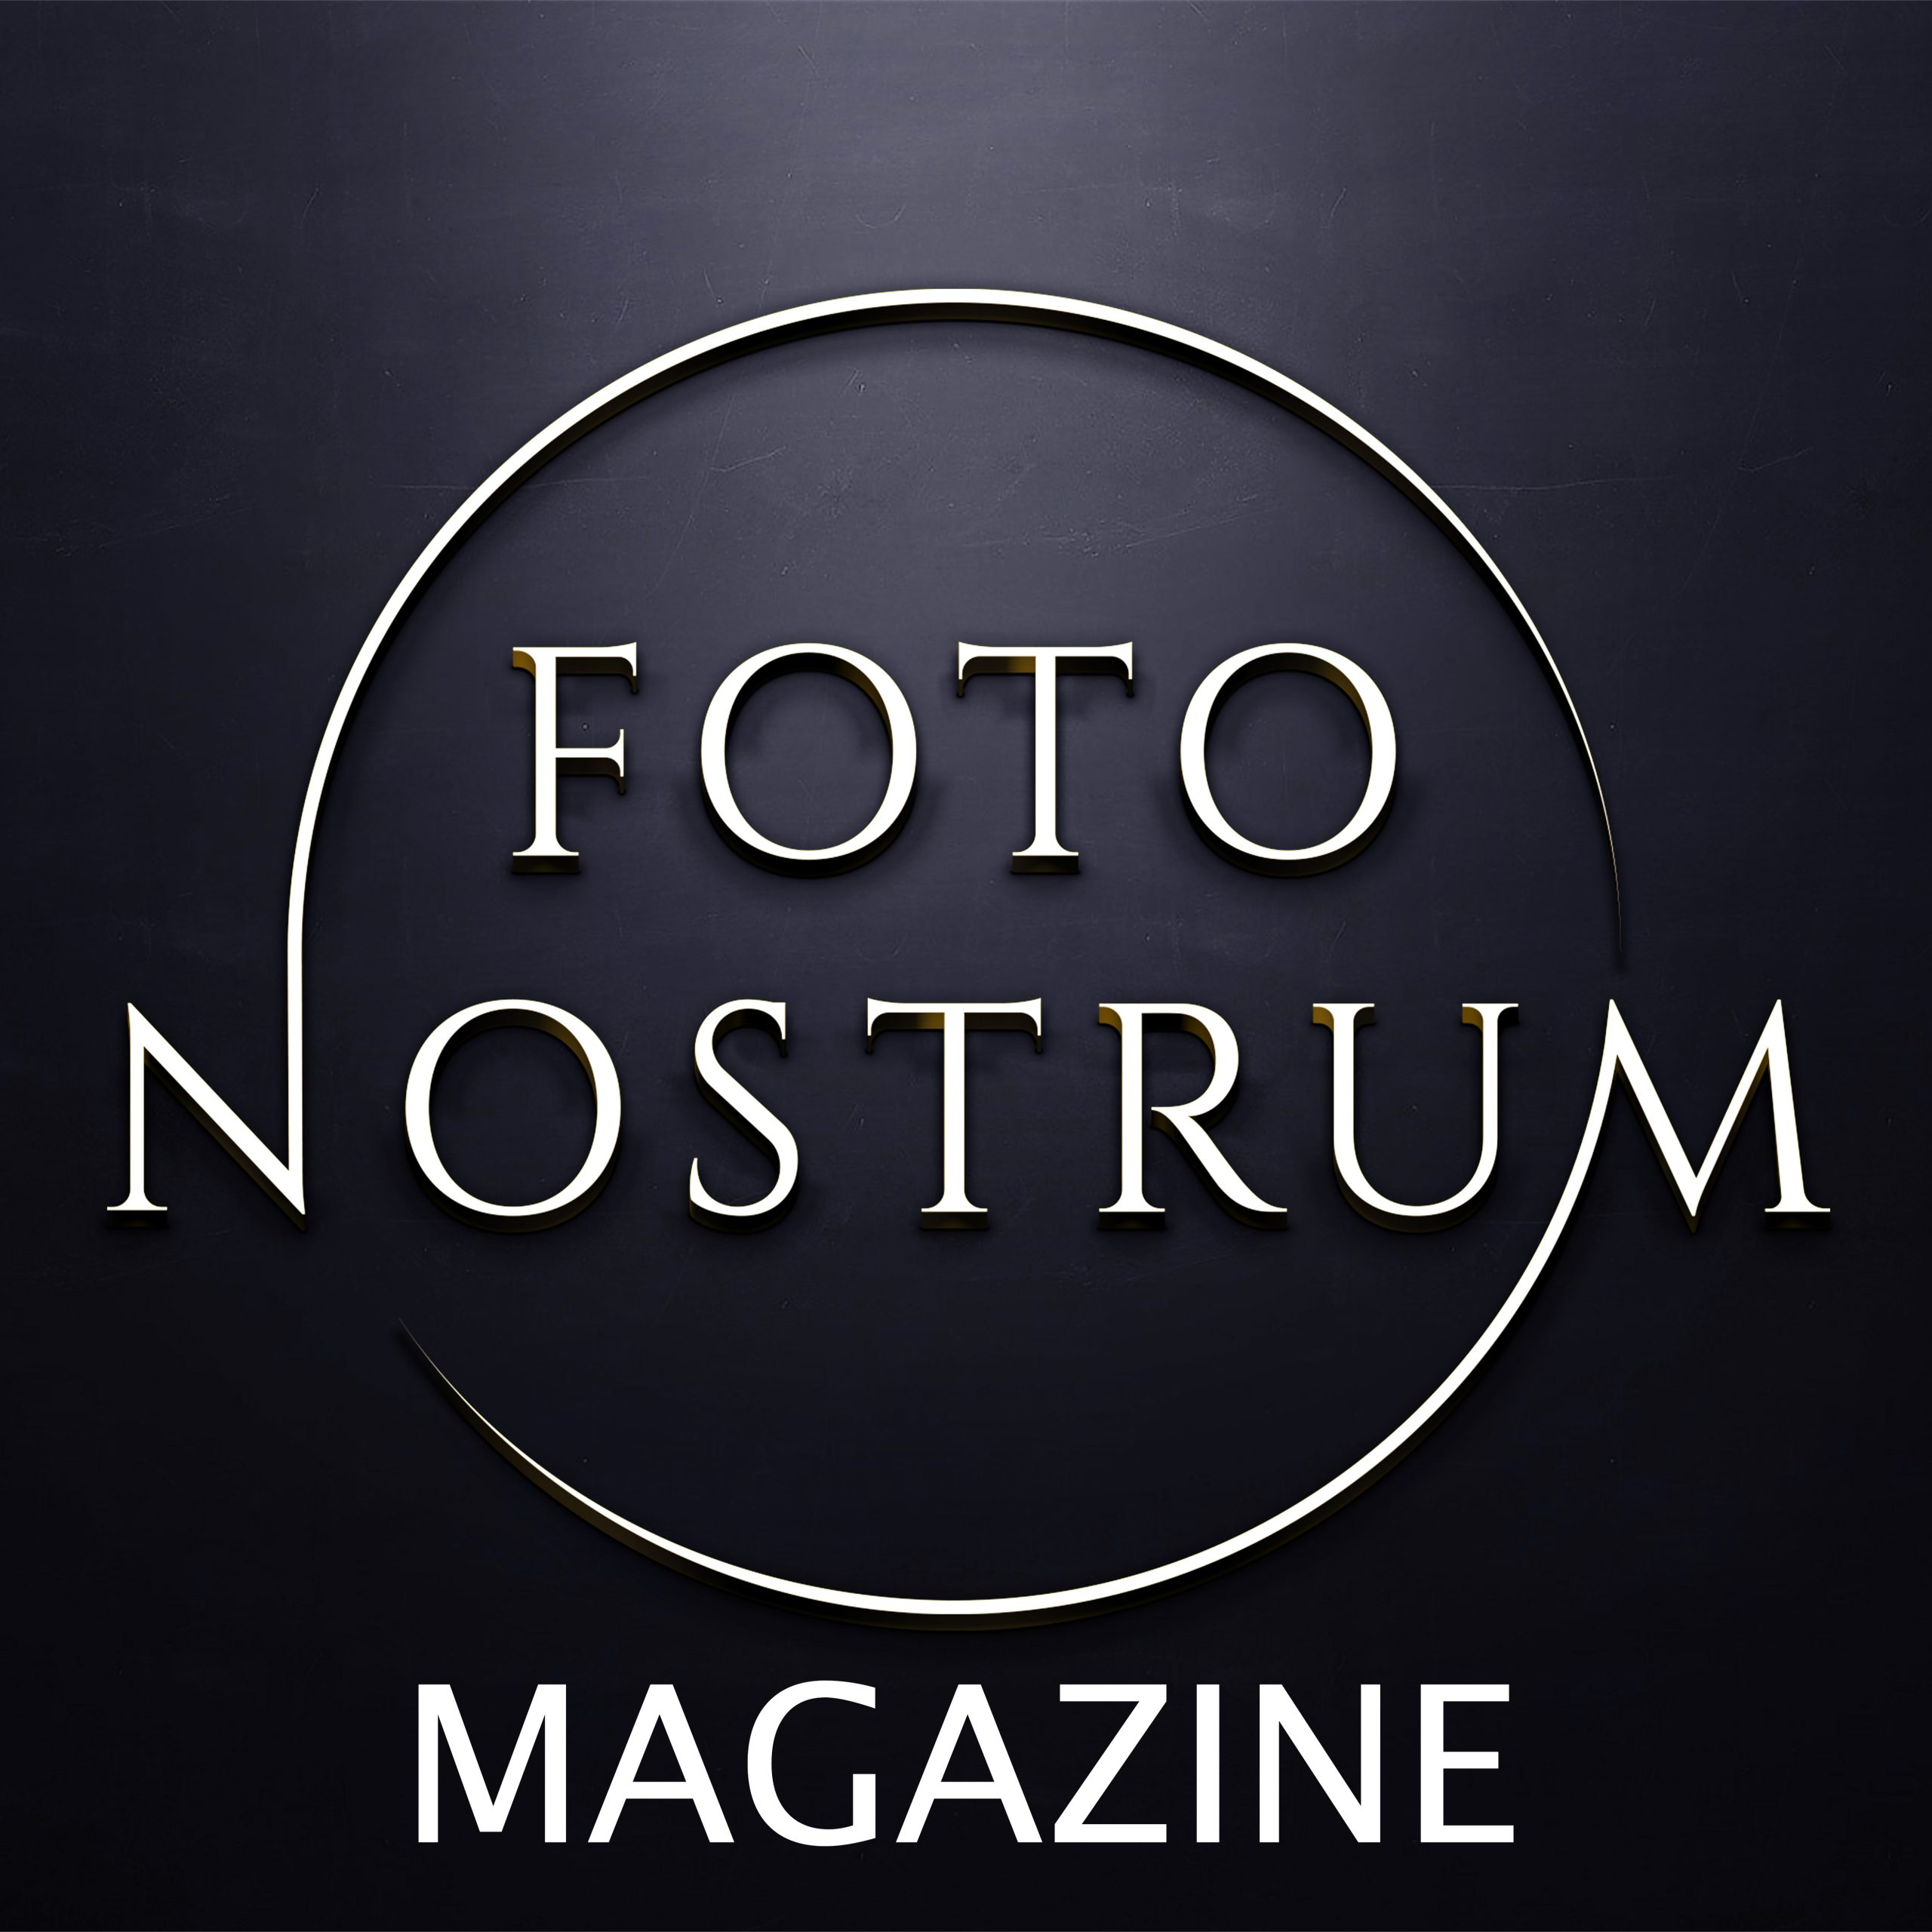 FotoNostrum Magazine Portfolio Contest 2021 - logo